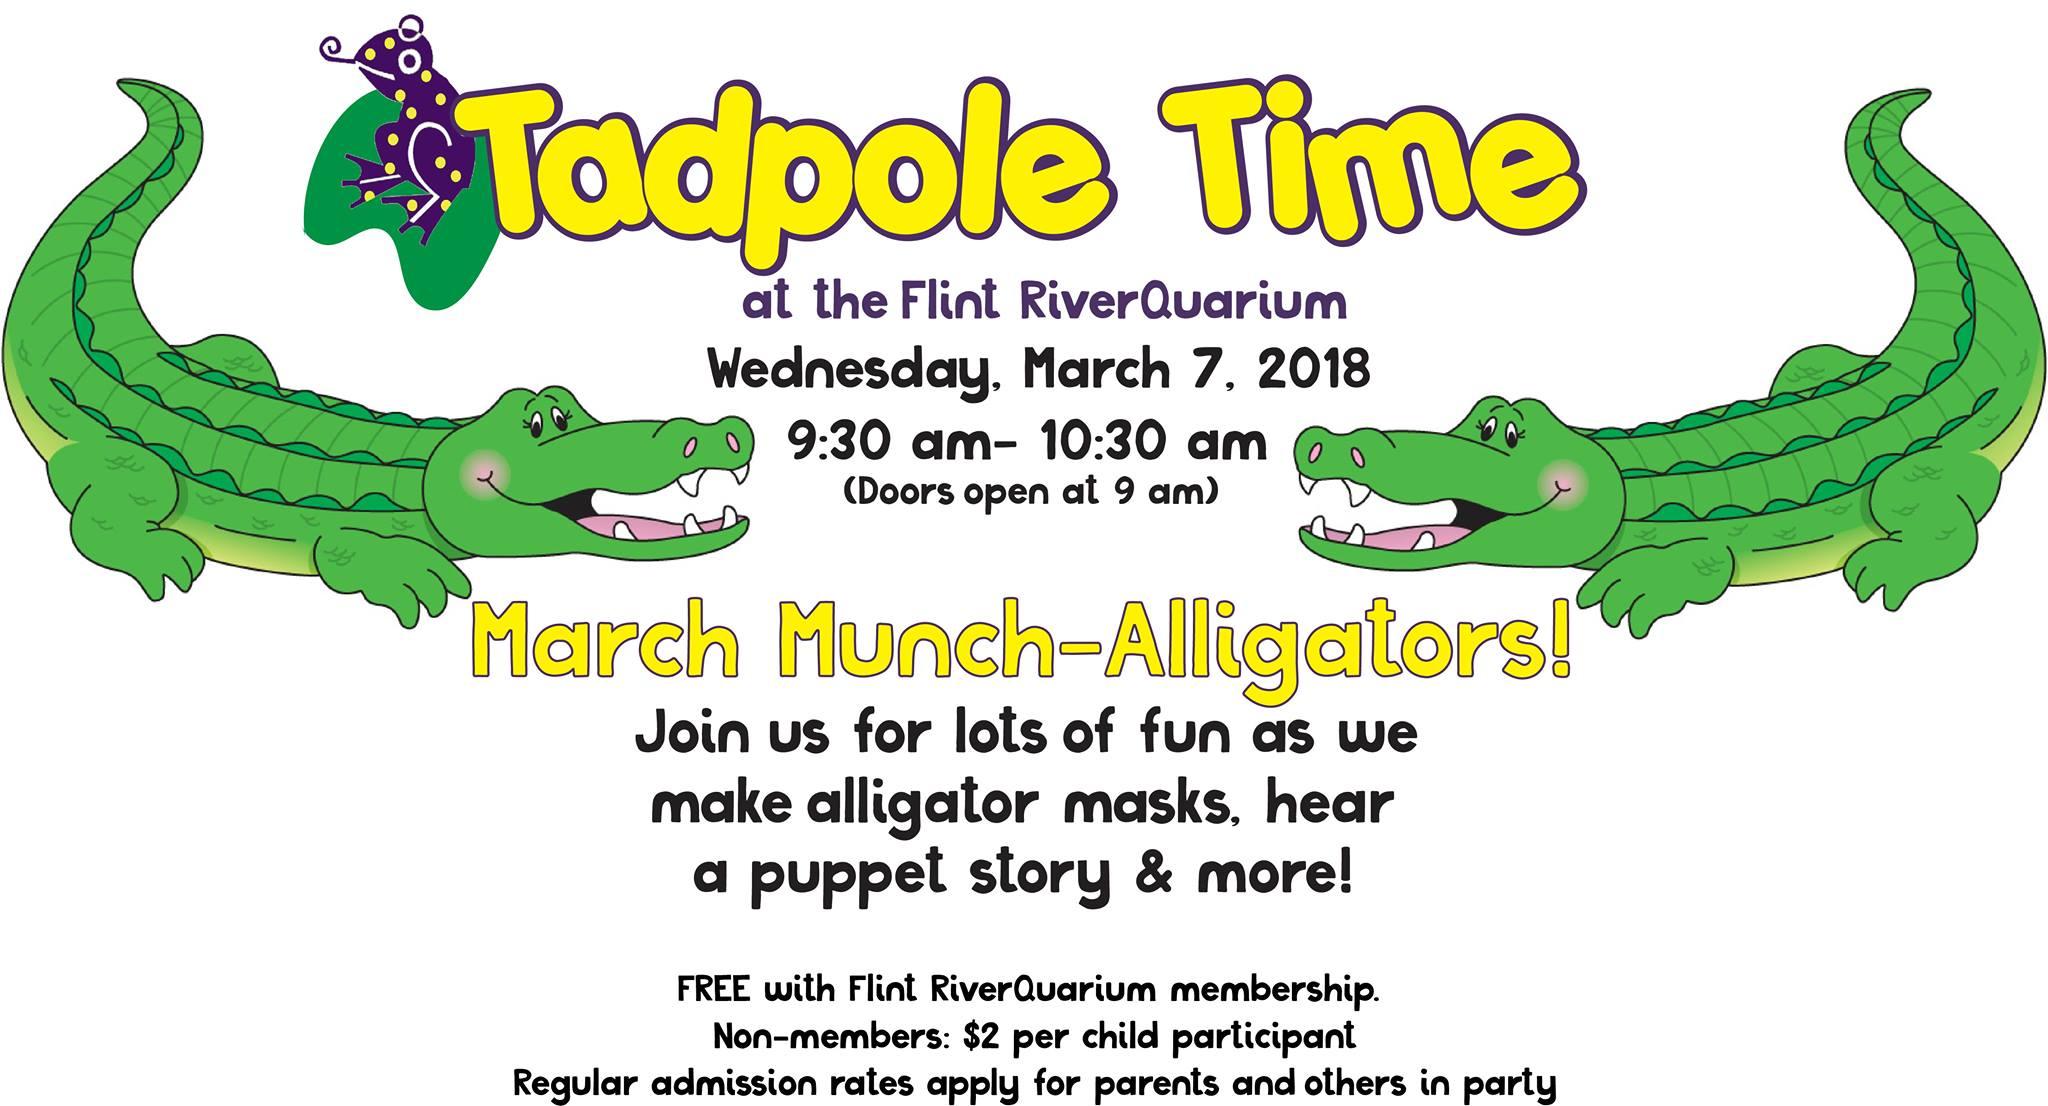 Tadpole Time: March Munch-Alligators!